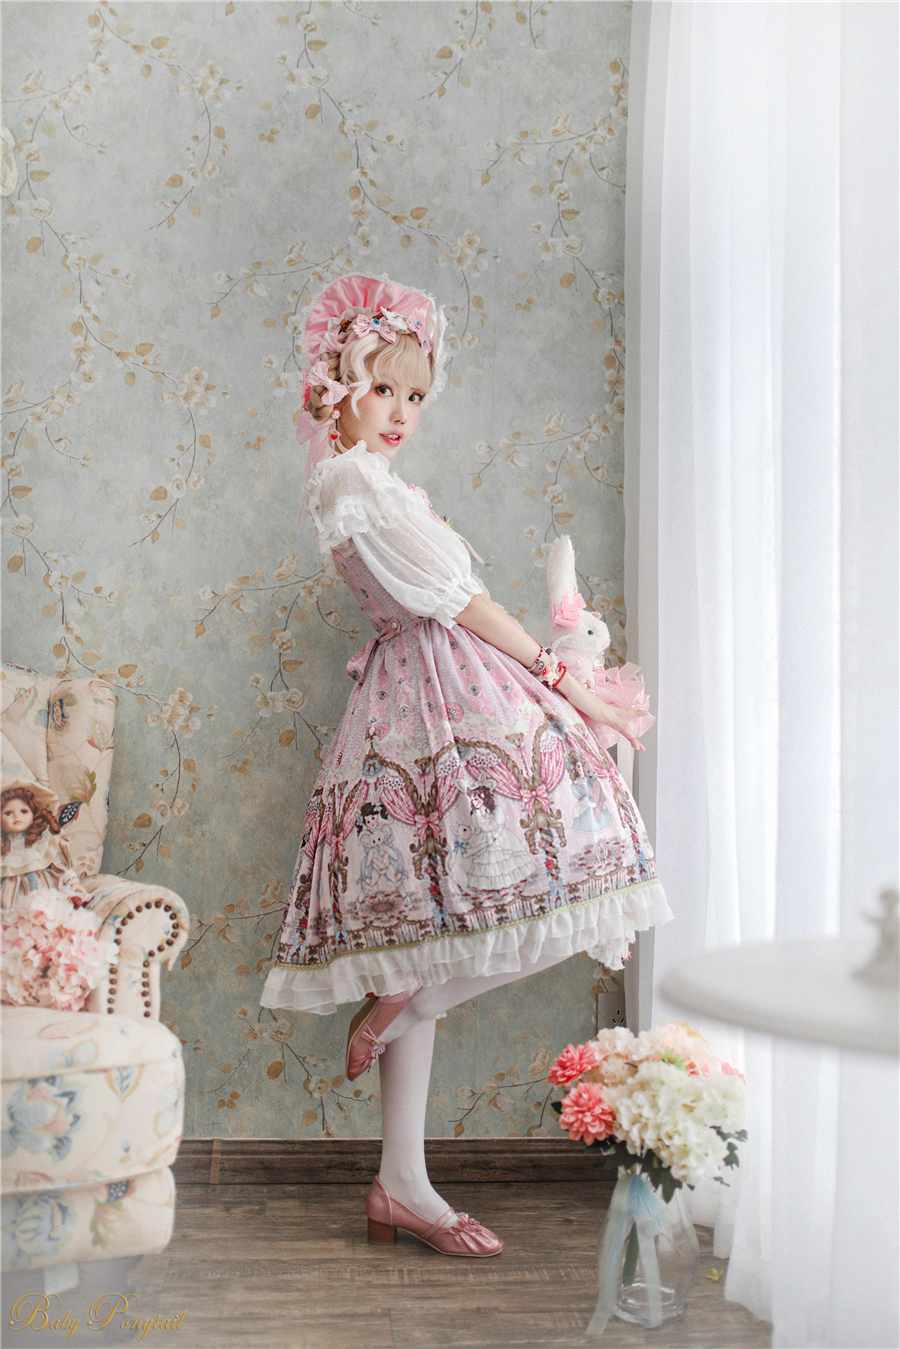 BabyPonytail_Model Photo_My Favorite Companion_JSK Pink_Kaka_03.jpg